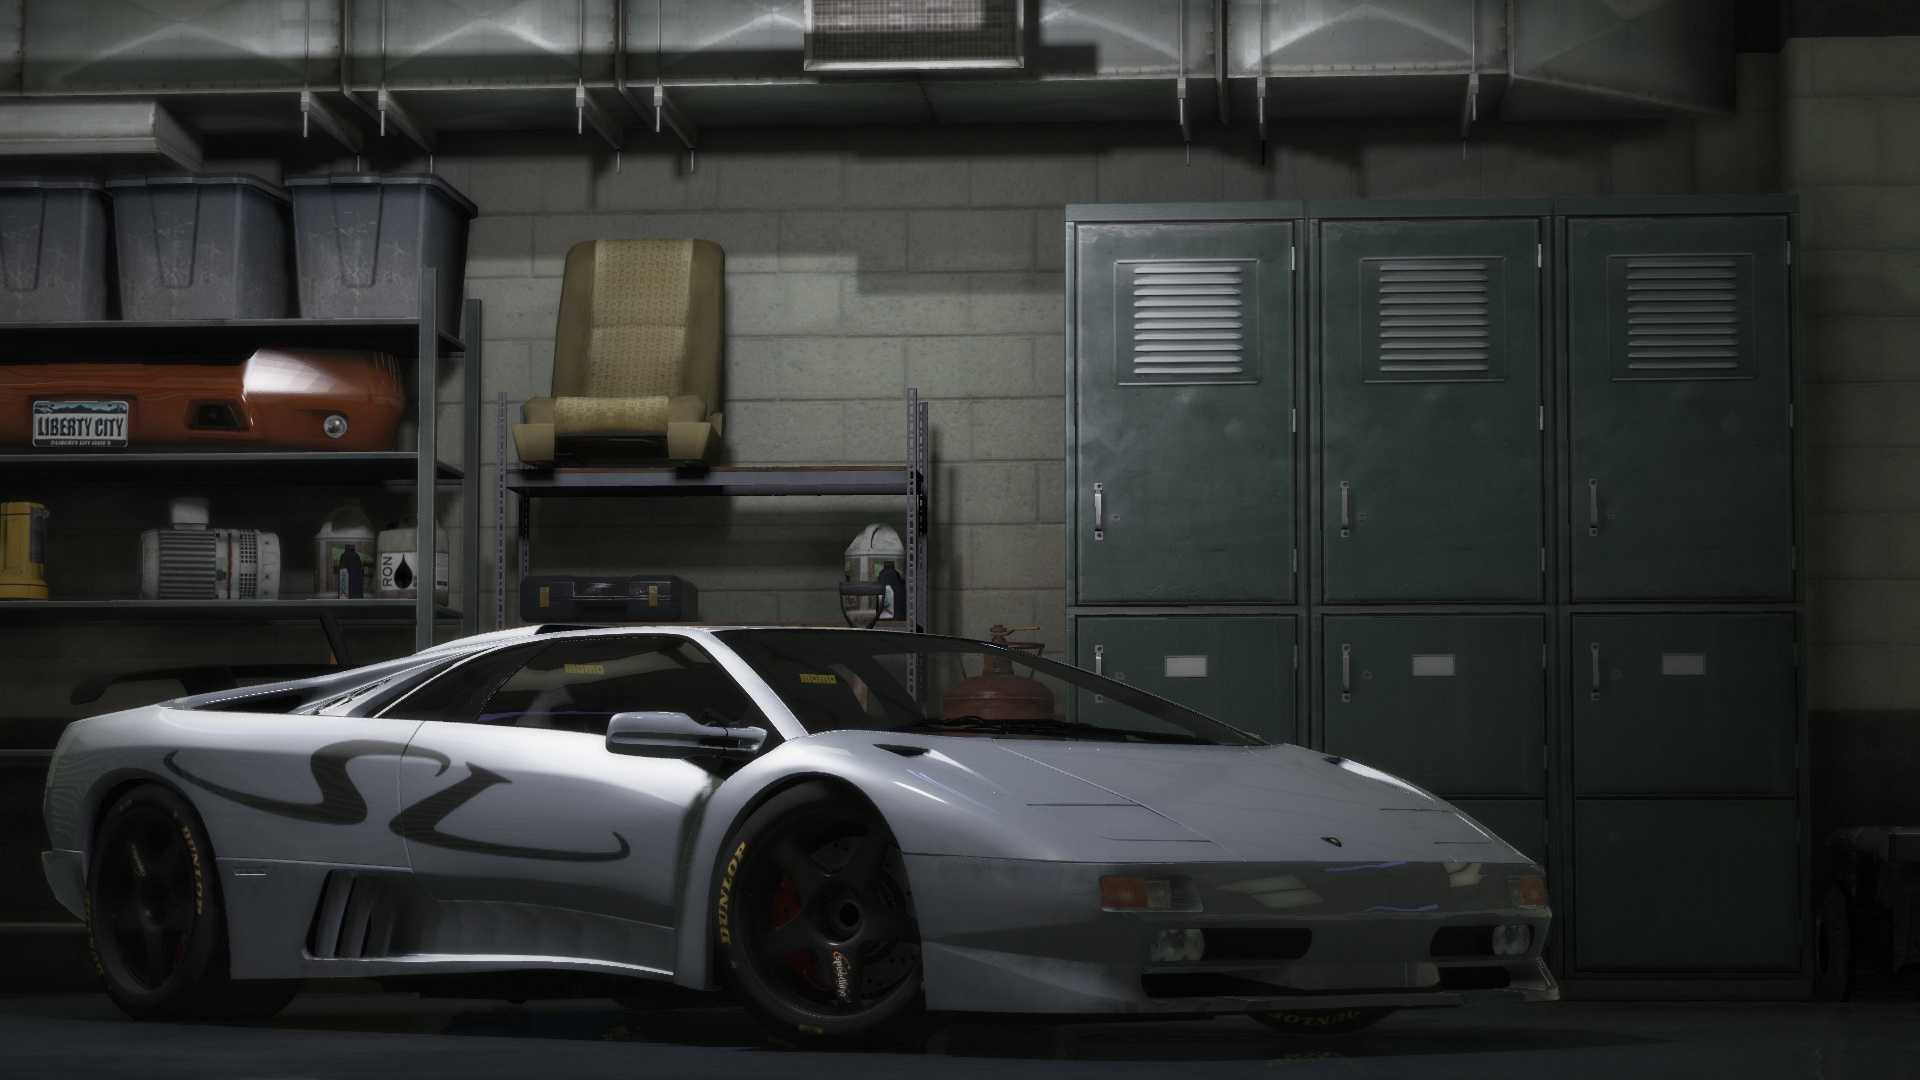 Lamborghini Diablo Gtr Add On Tuning Template Gta5 Mods Com